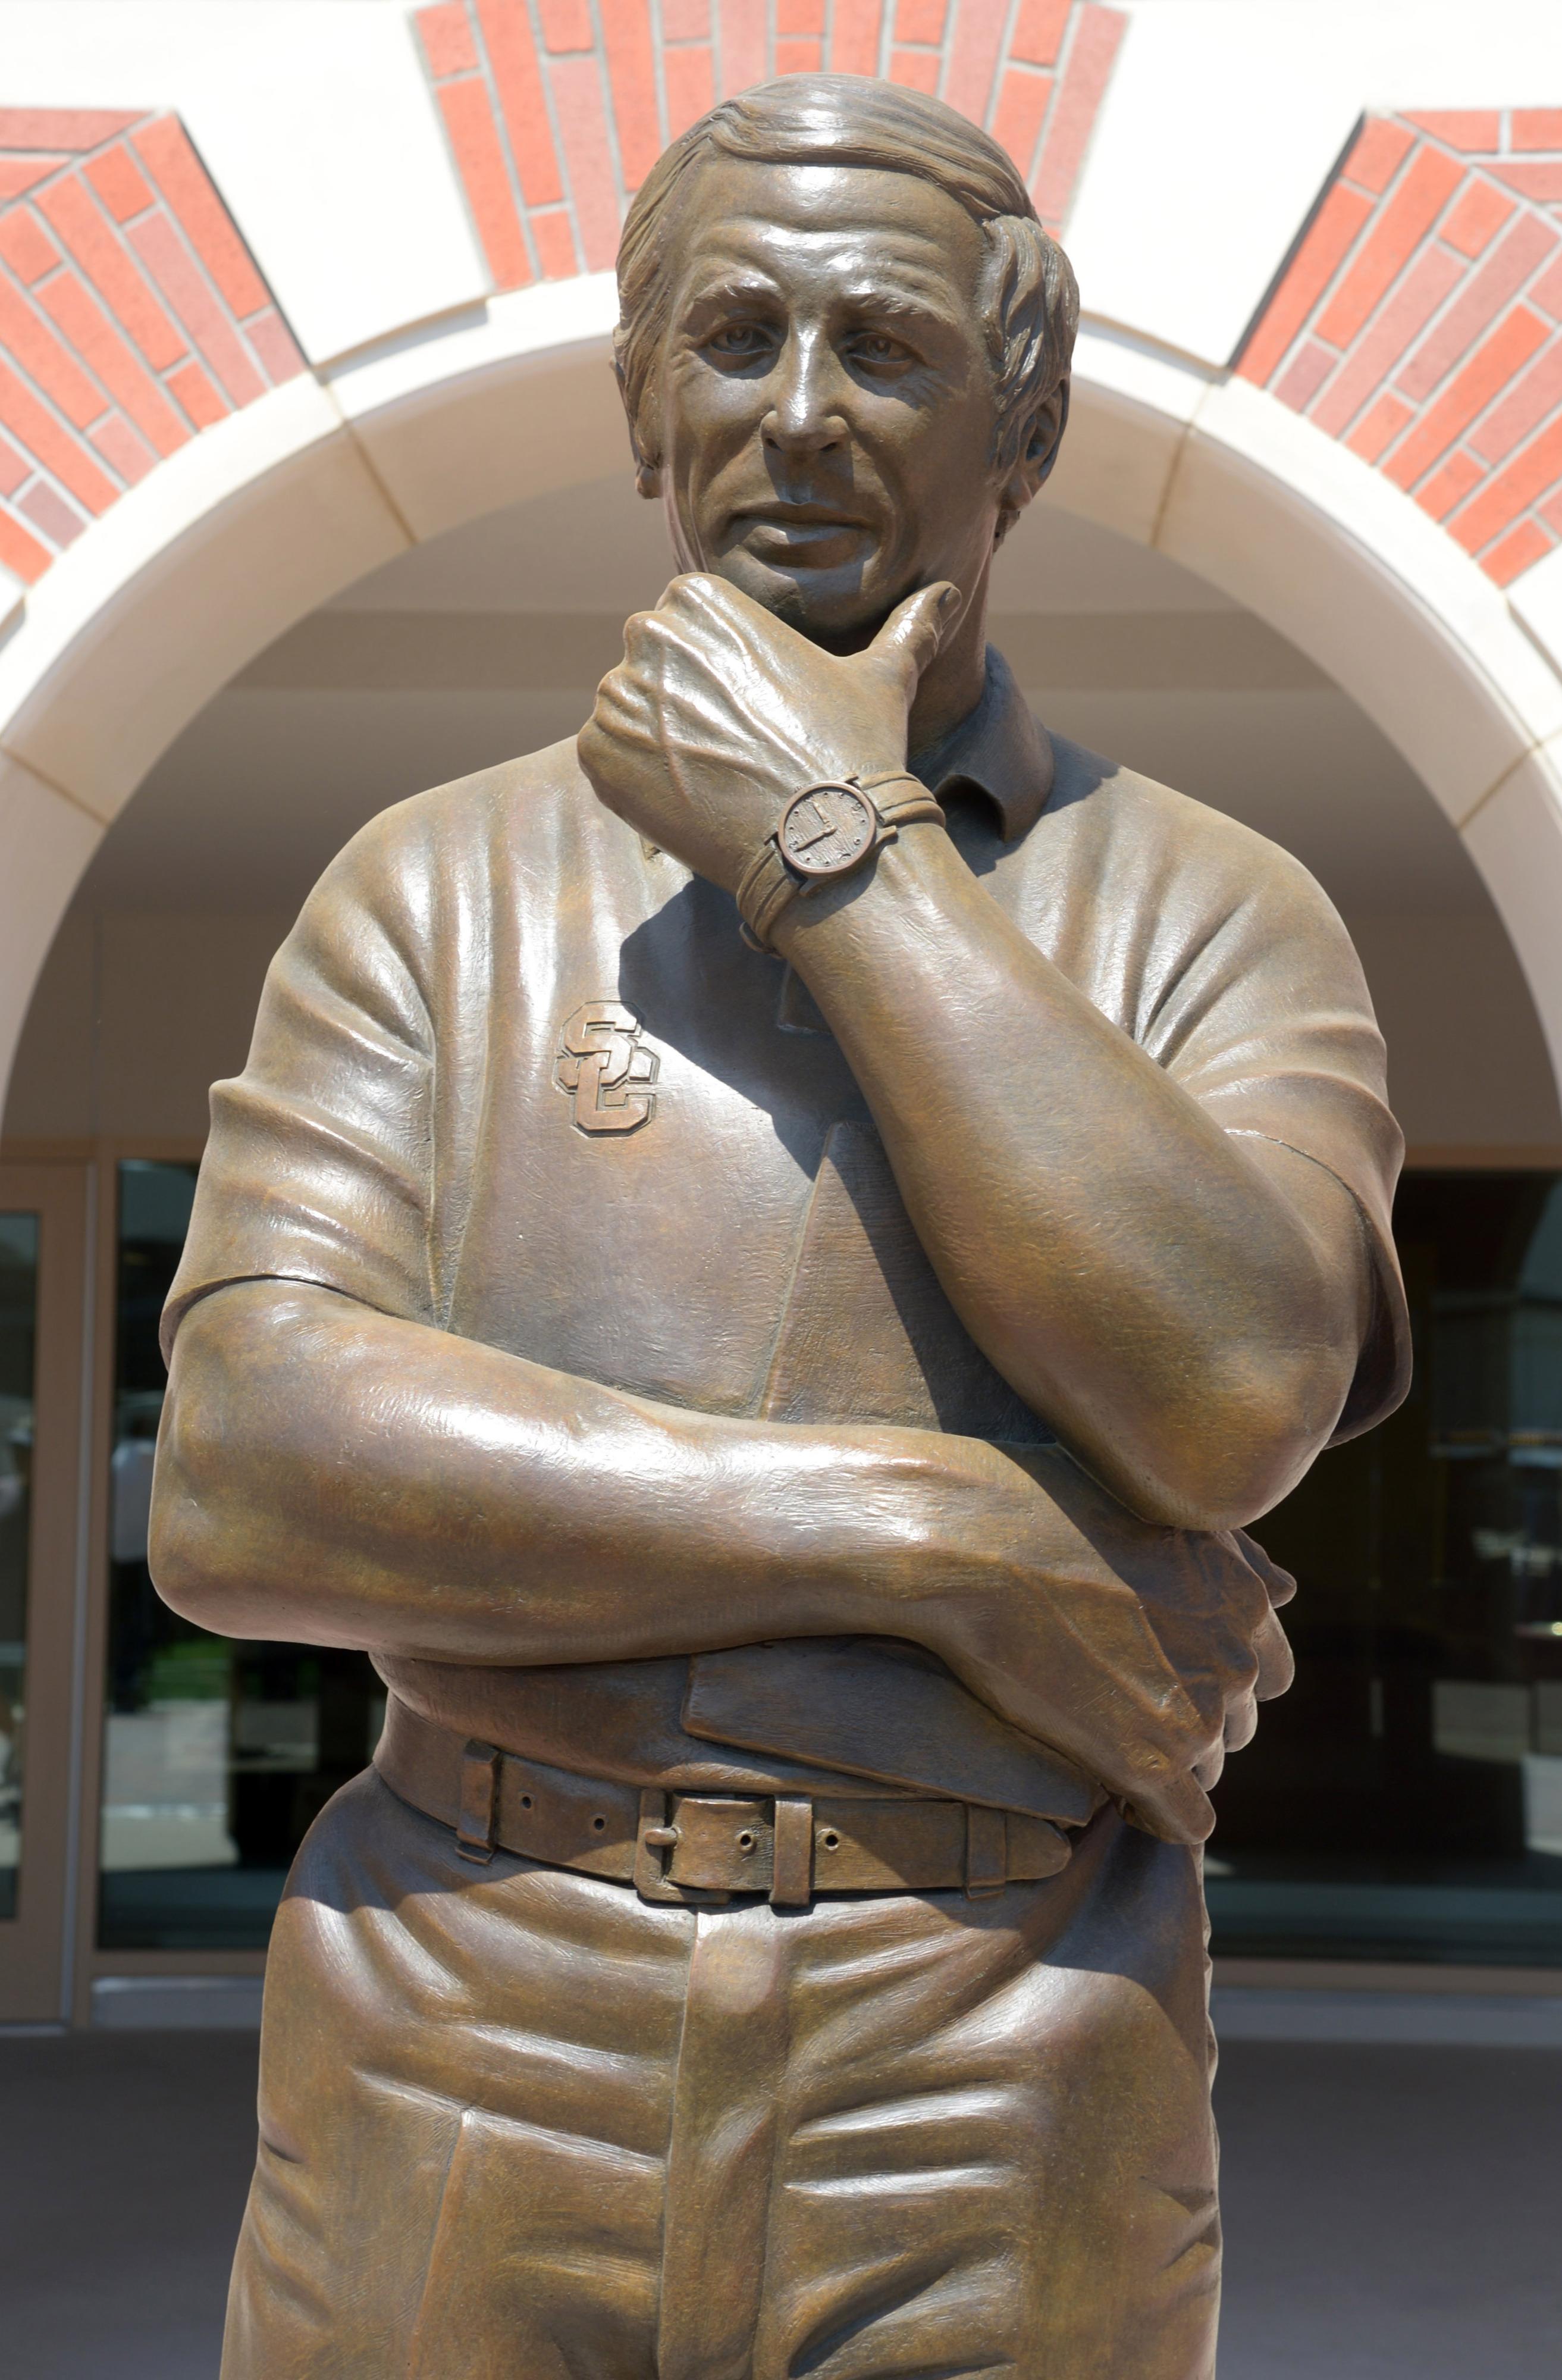 John McKay's statue at USC.